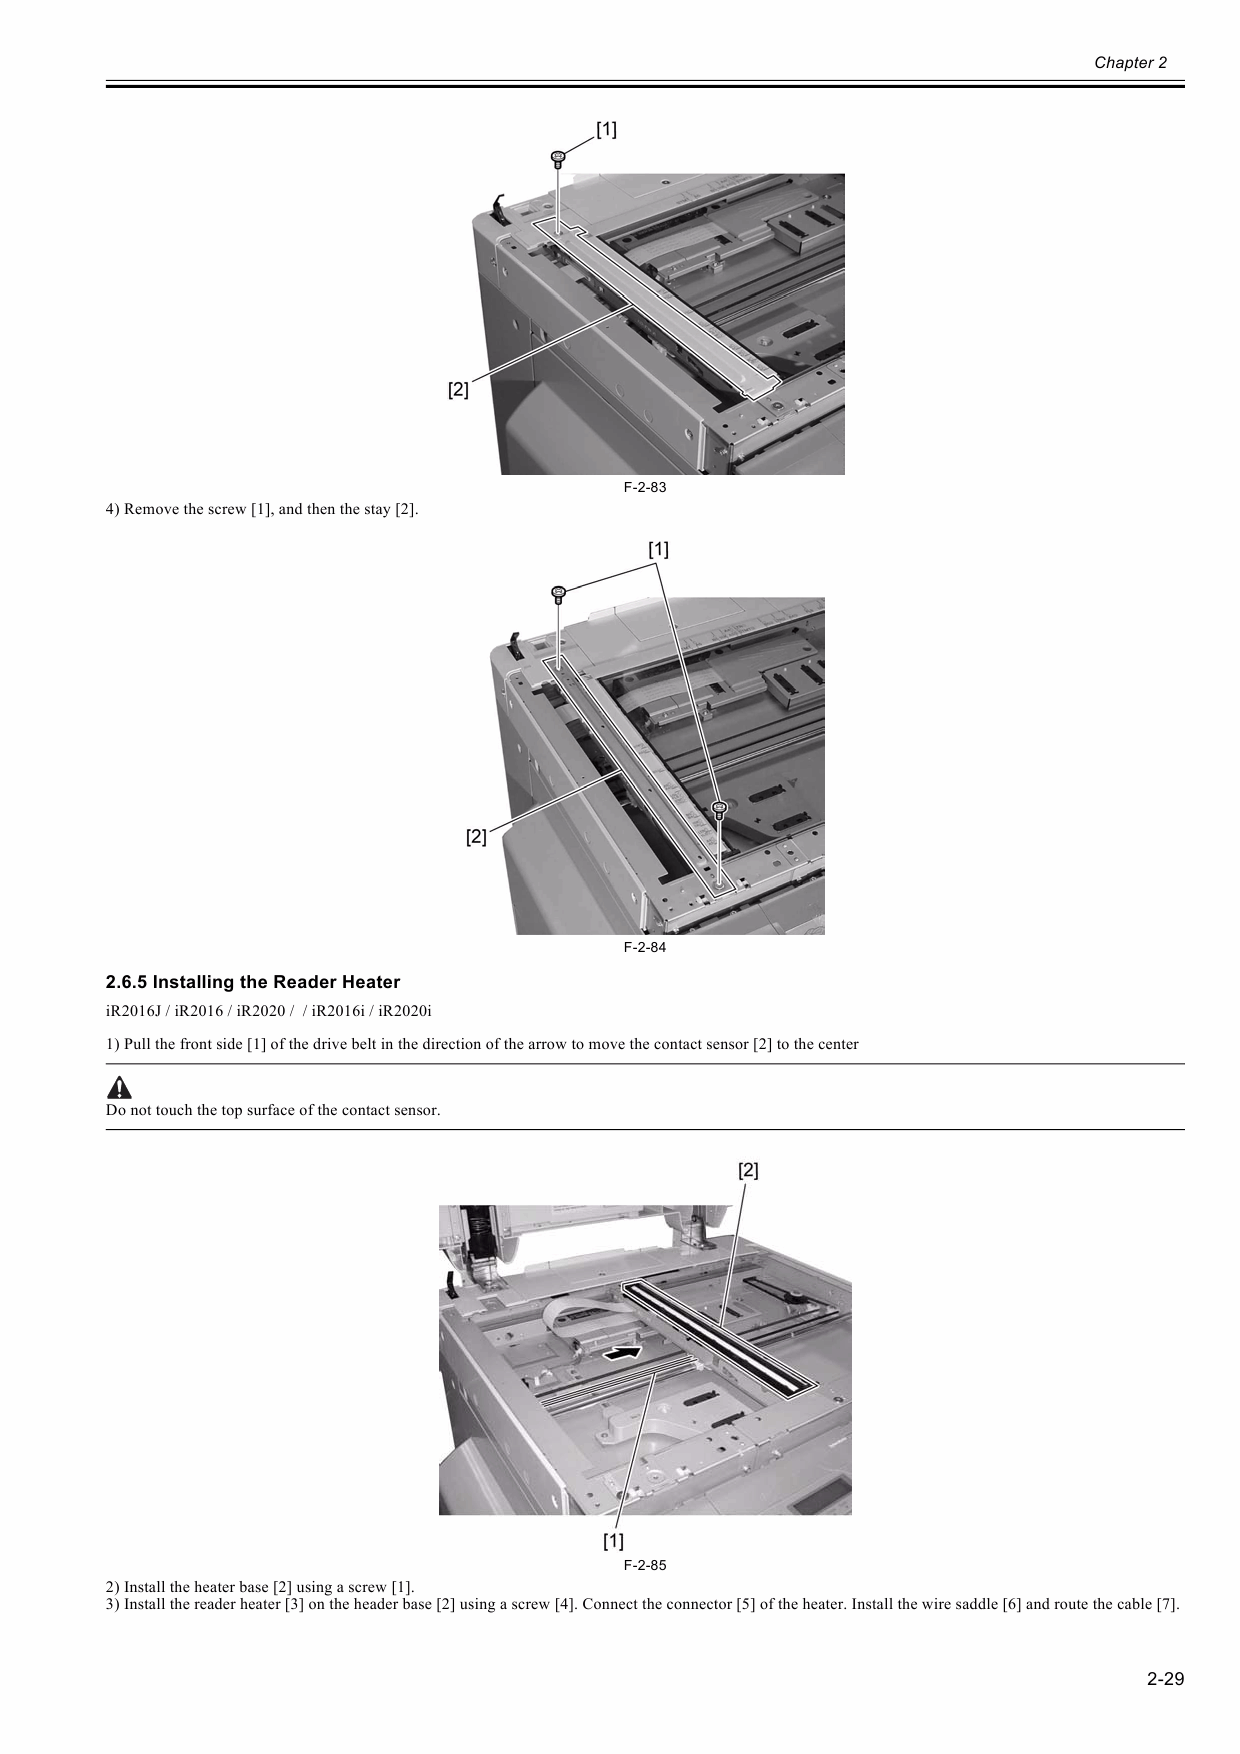 canon ir 2050 service manual pdf